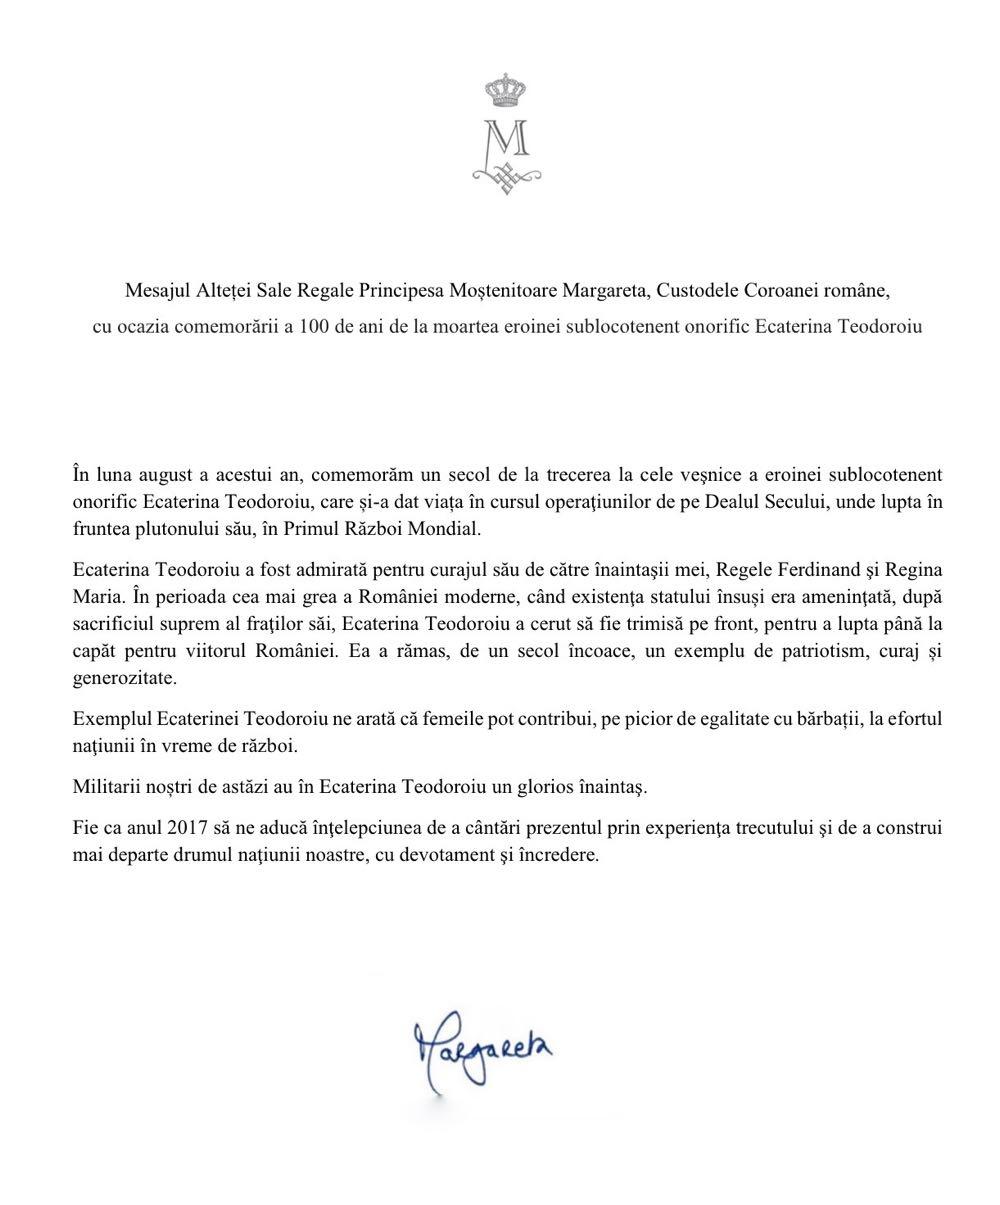 Mesaj ASR Principesa Mostenitoare a Romaniei - Mesaj la comemorarea MApN Ecaterina Teodoroiu 17martie2017